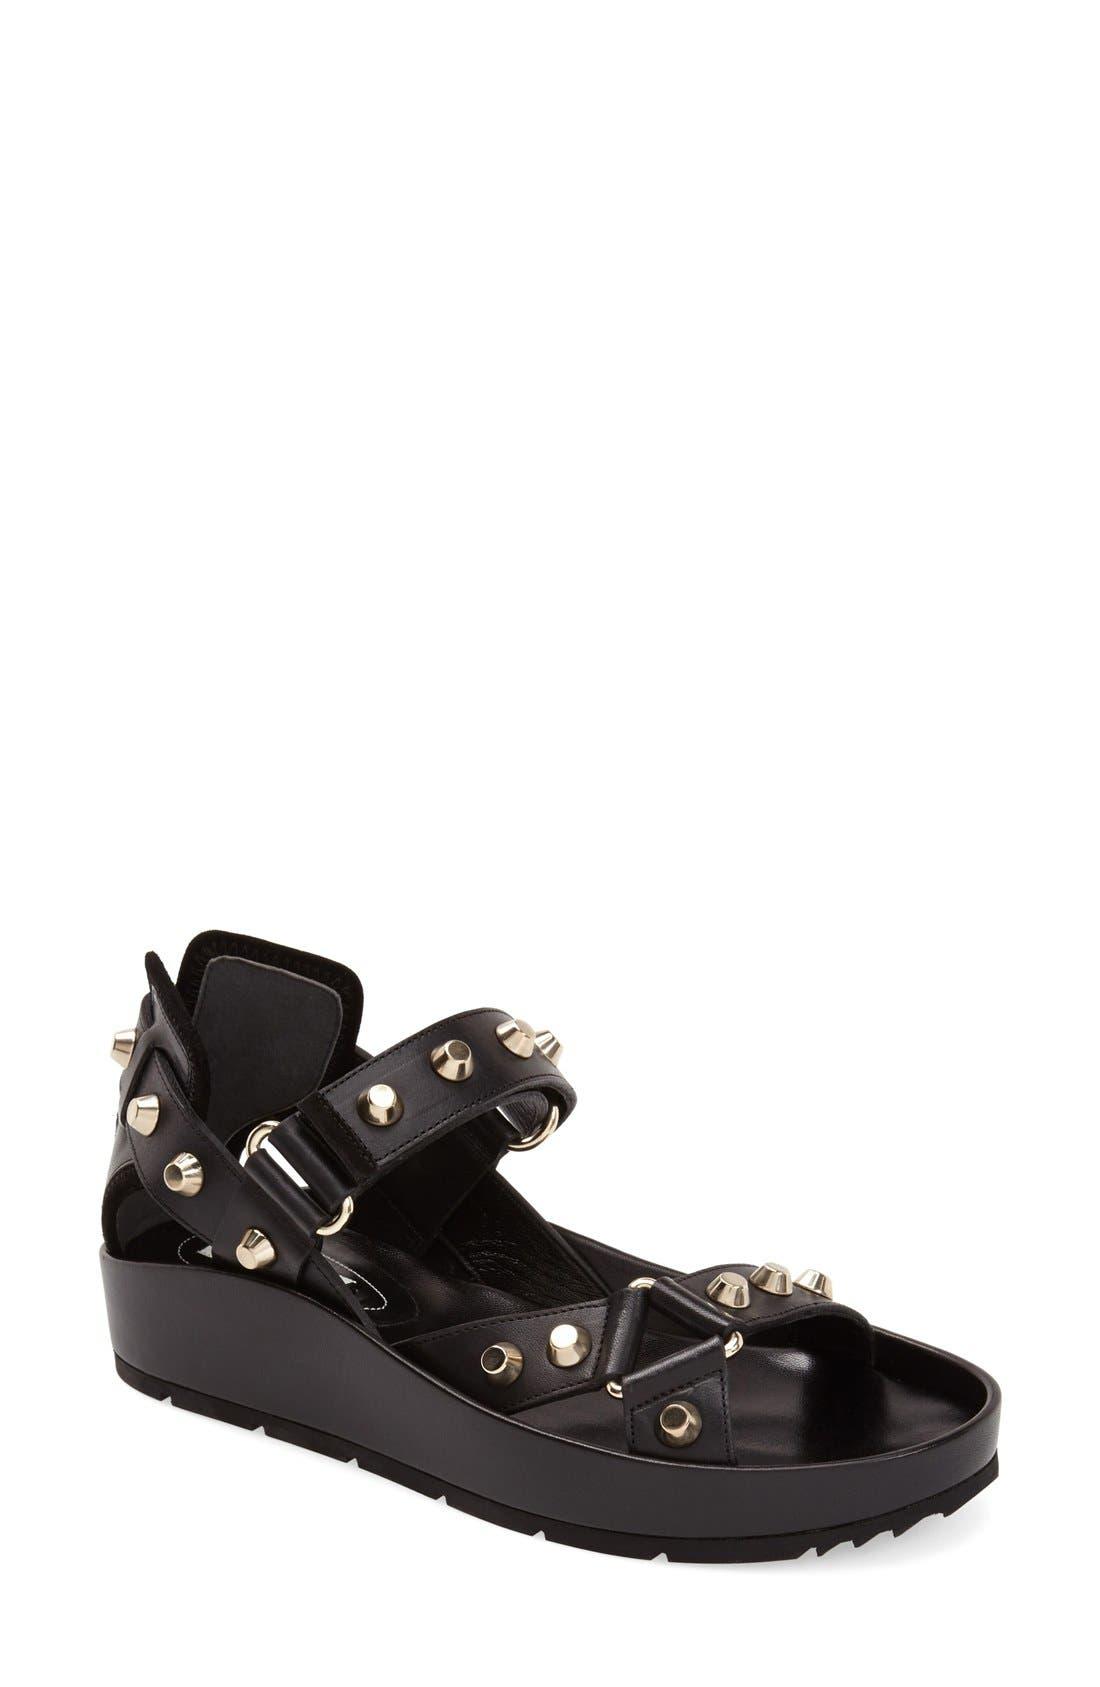 Studded Leather Sandal, Main, color, 001